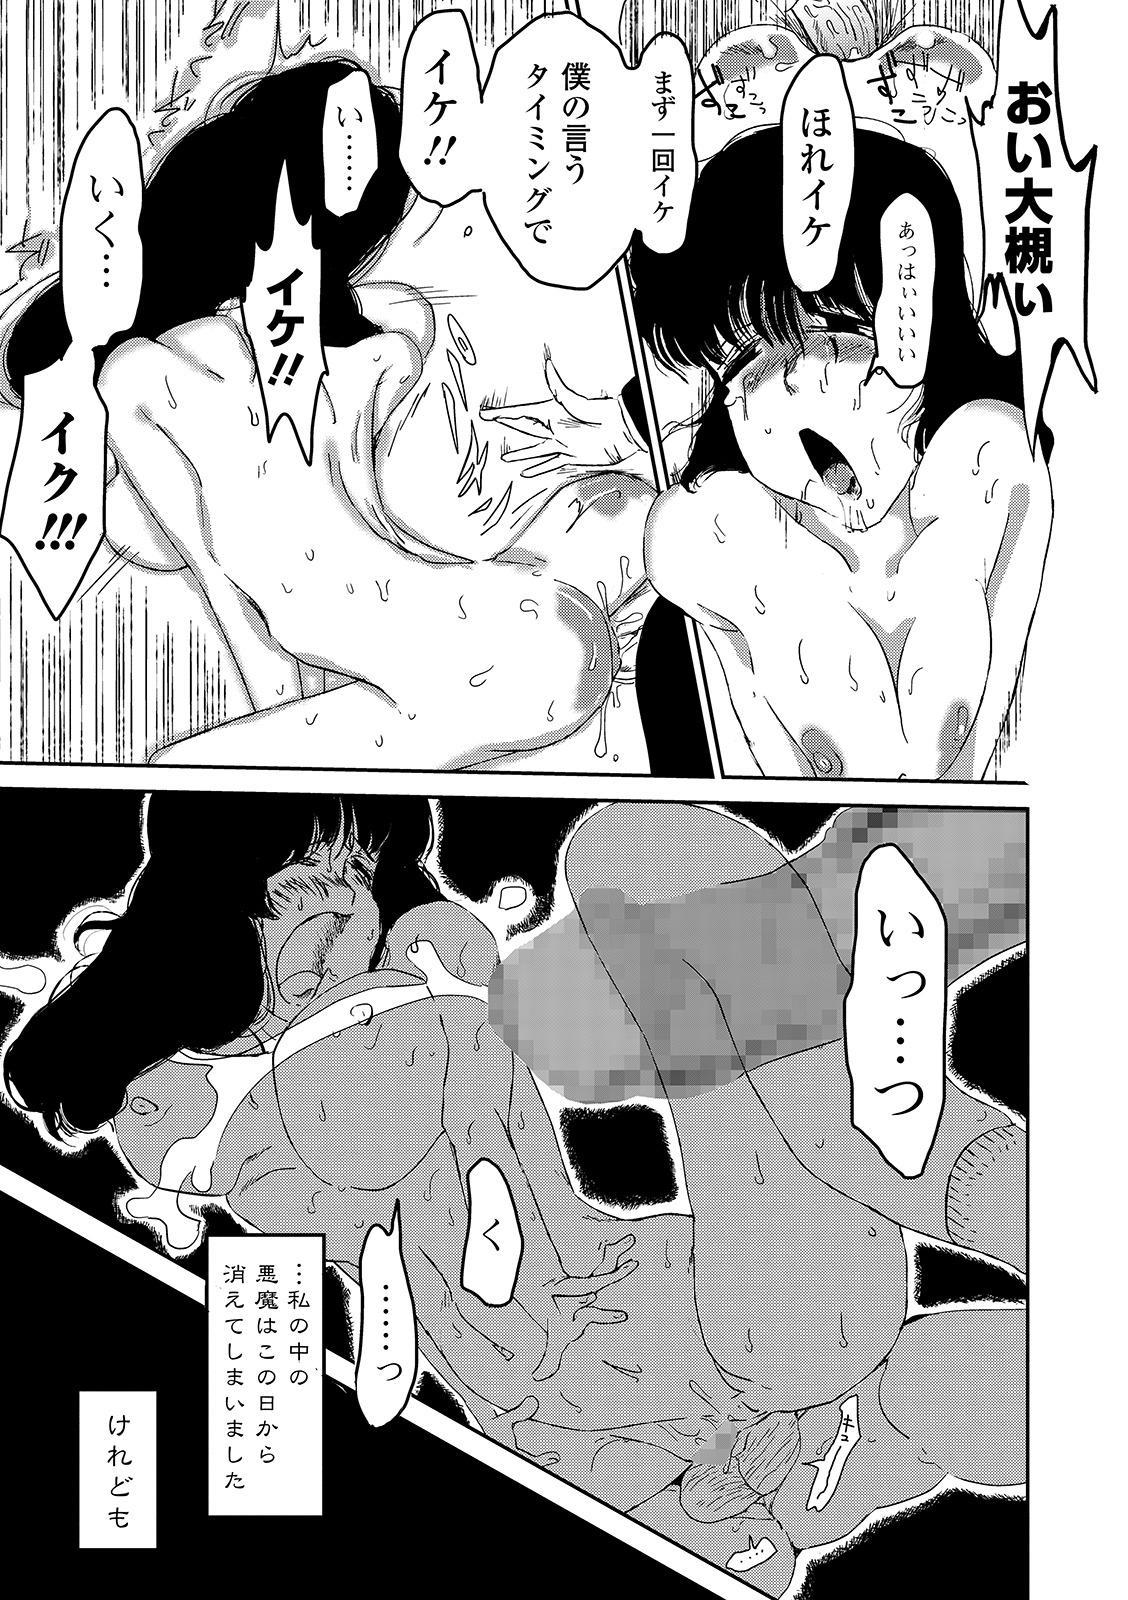 COMIC Shigekiteki SQUIRT!! Vol. 15 238